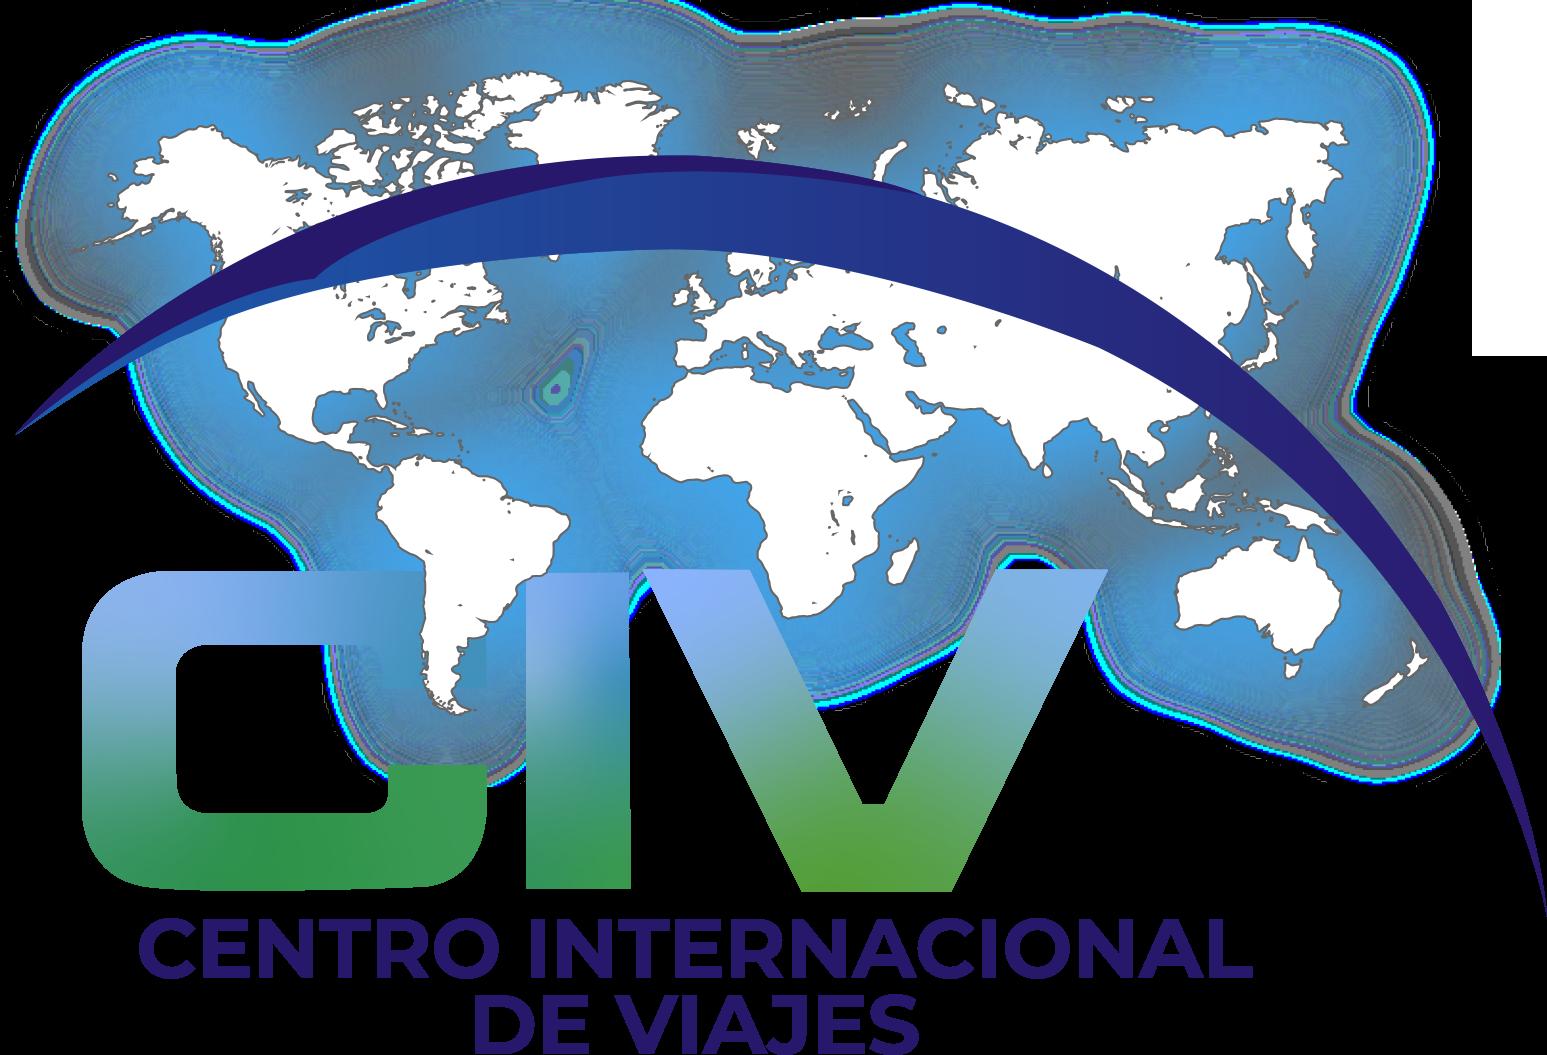 Centro Internacional de Viajes